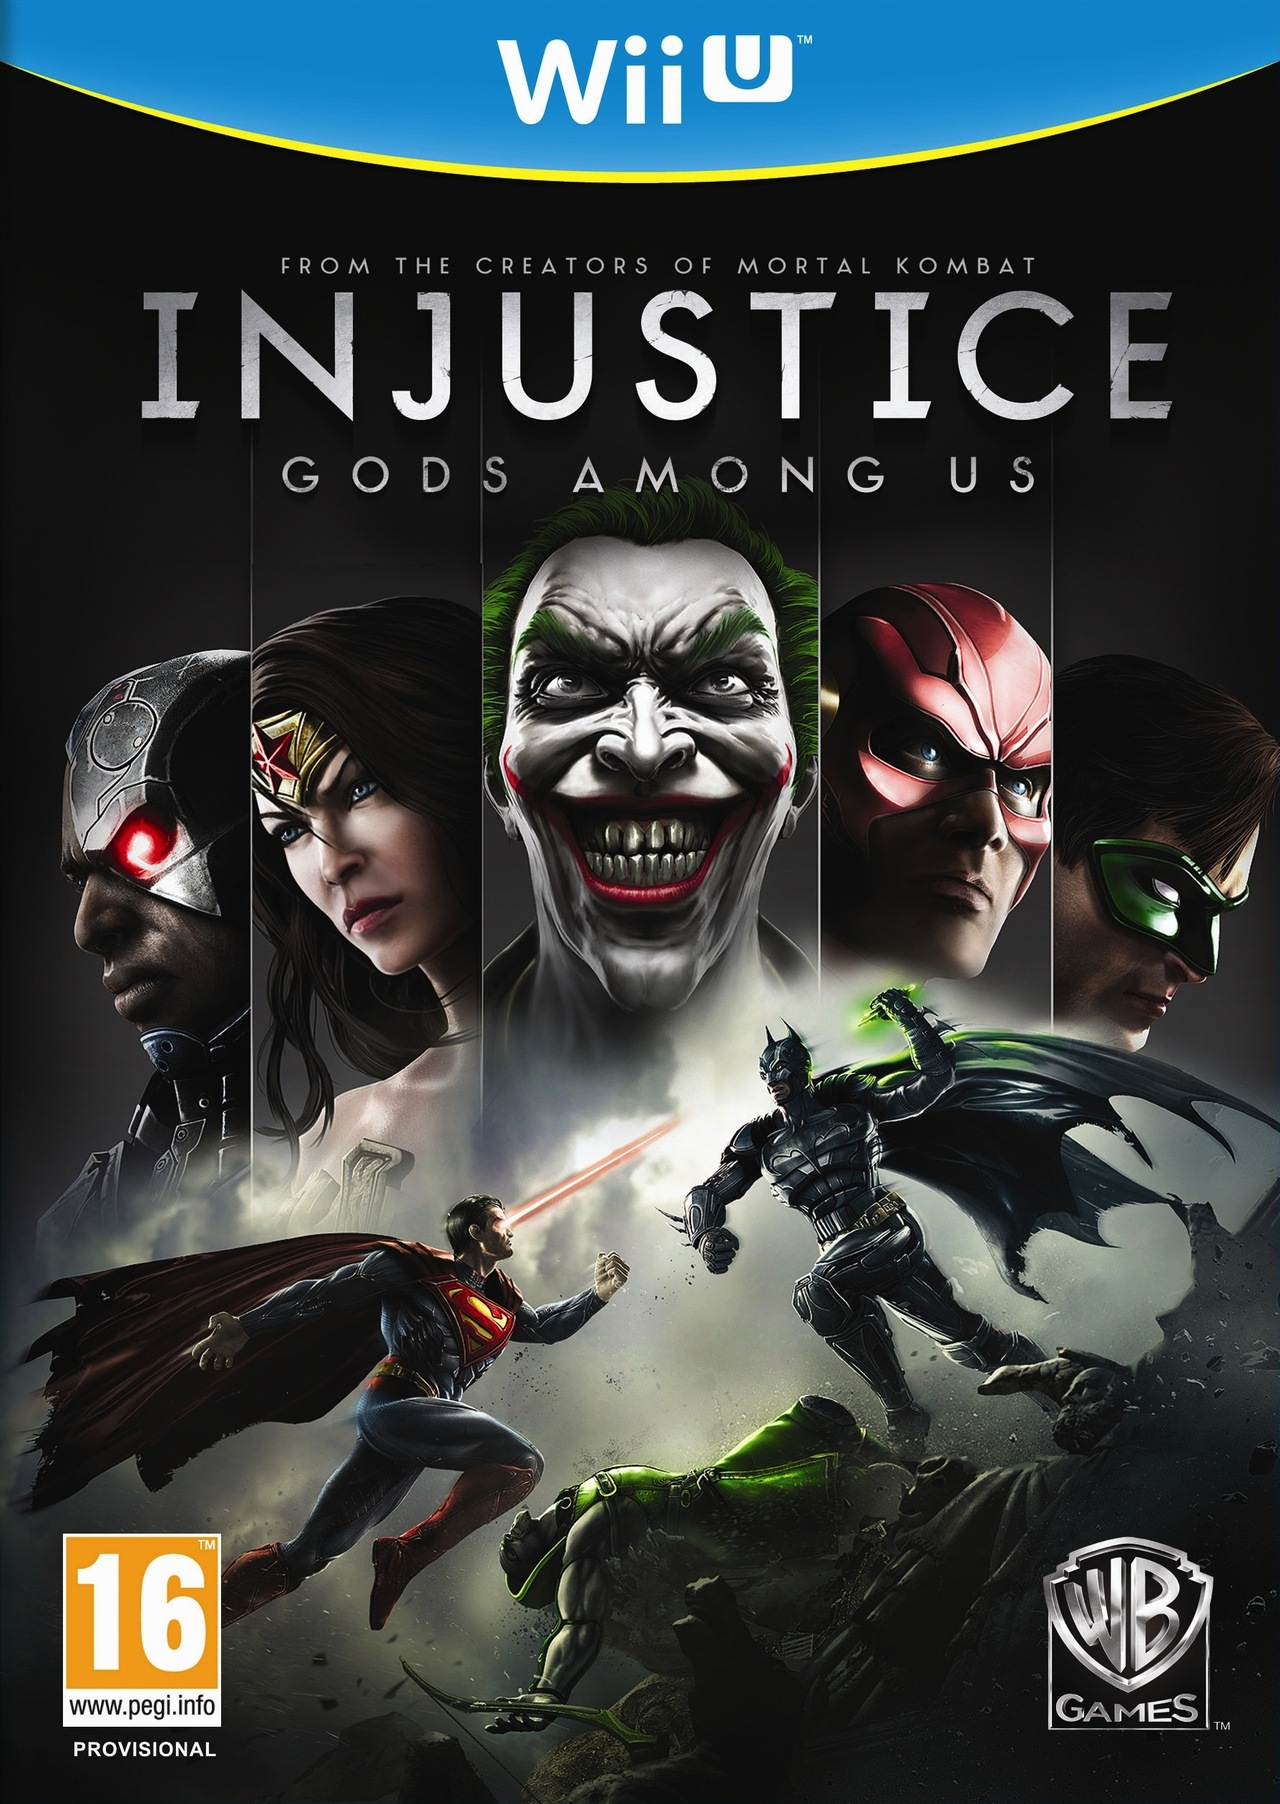 Injustice-LesDieuxSontParmiNous Wii U Jaquette 001